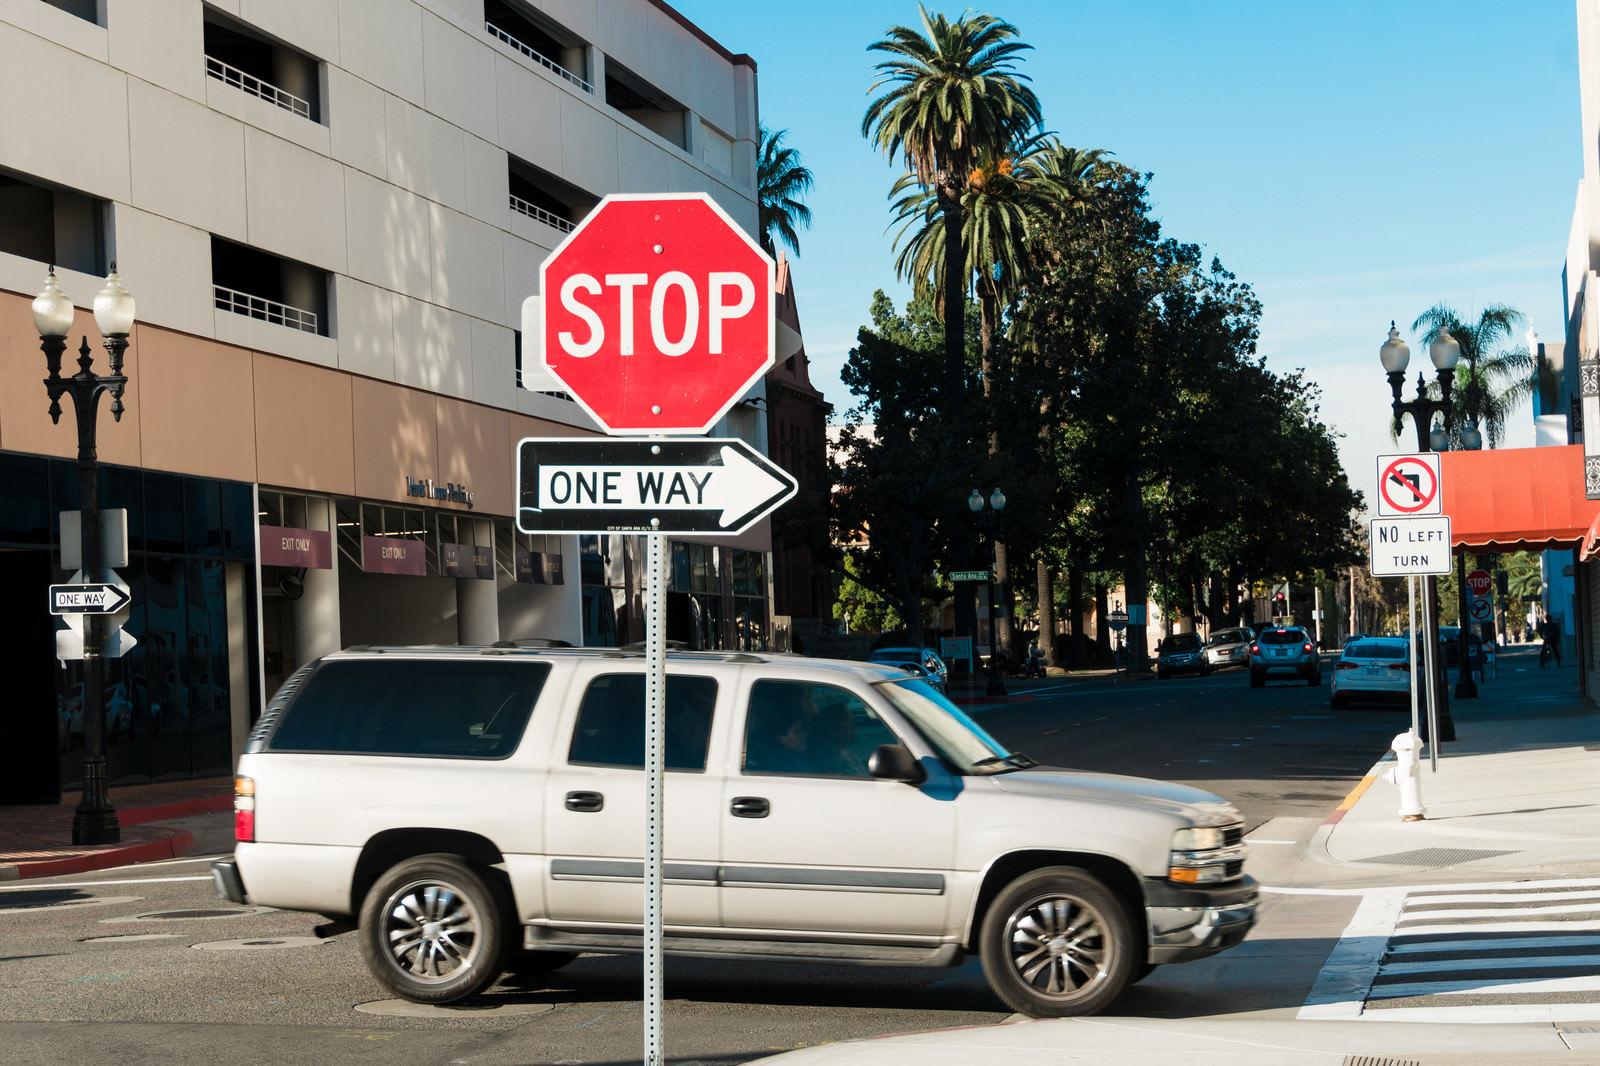 「STOP ONE WAY」の写真